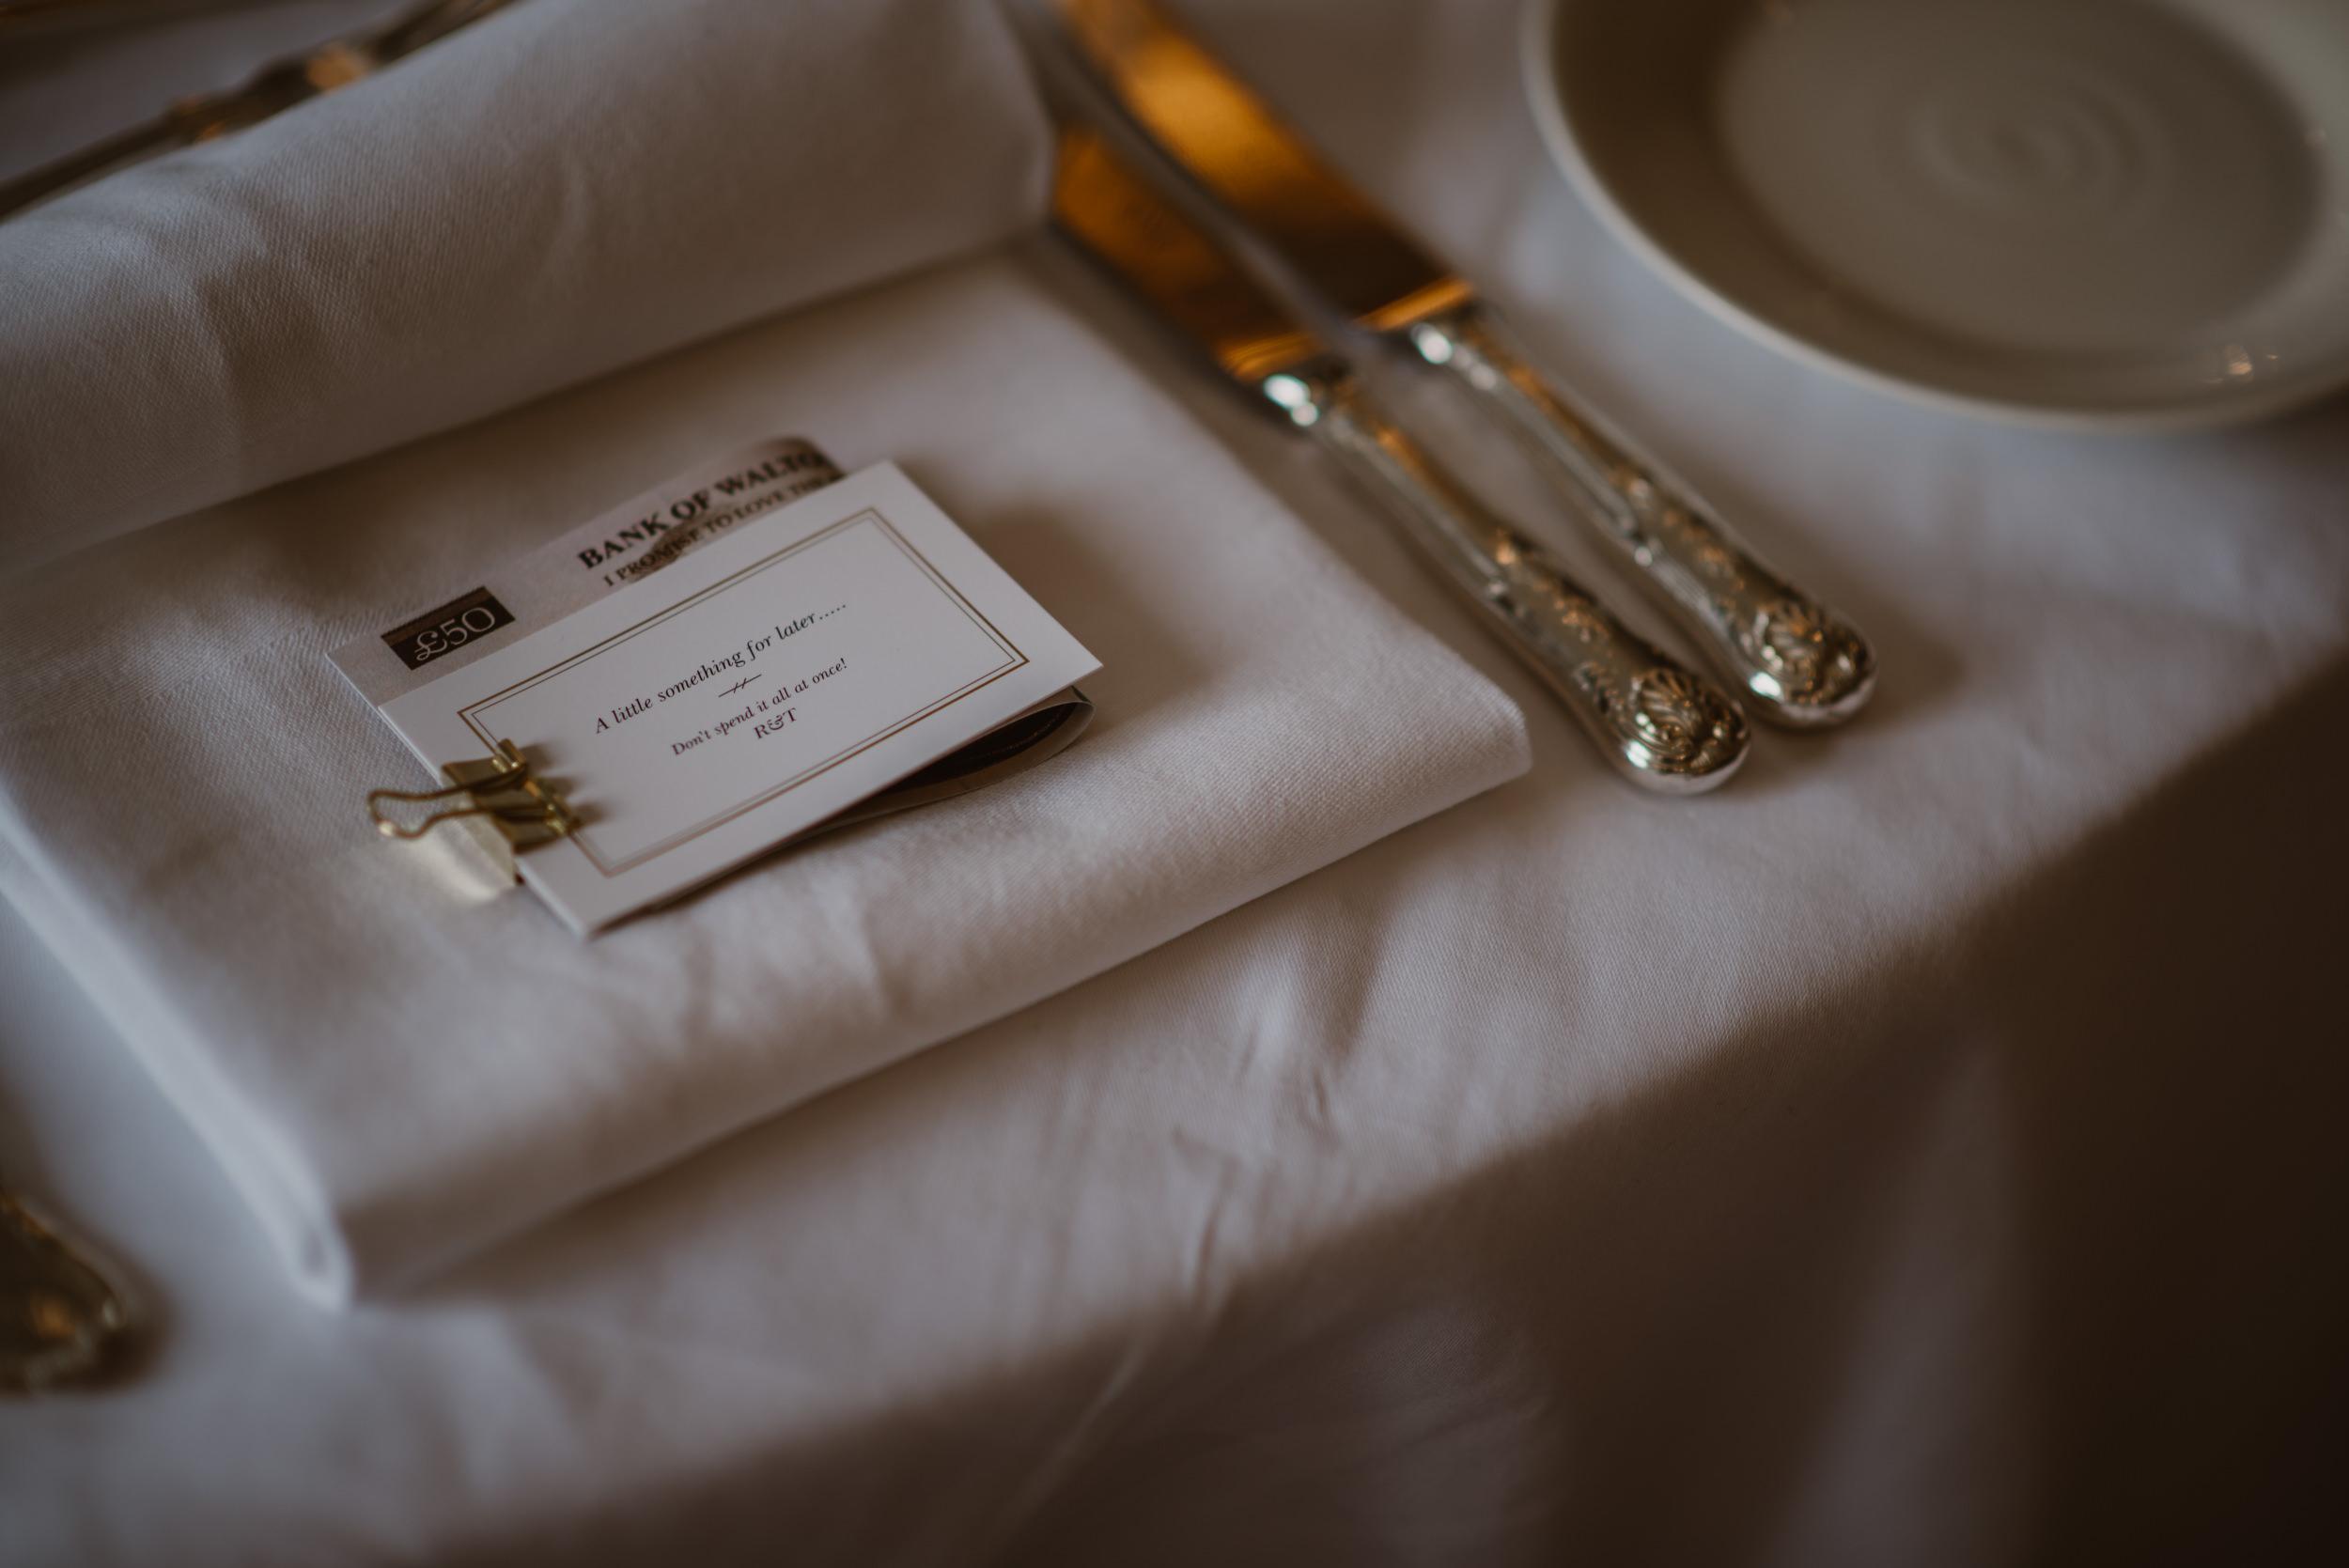 Trisha-and-Roger-wedding-The-Priory-Church-and-Chewton-Glen-Hotel-Christchurch-Manu-Mendoza-Wedding-Photography-280.jpg